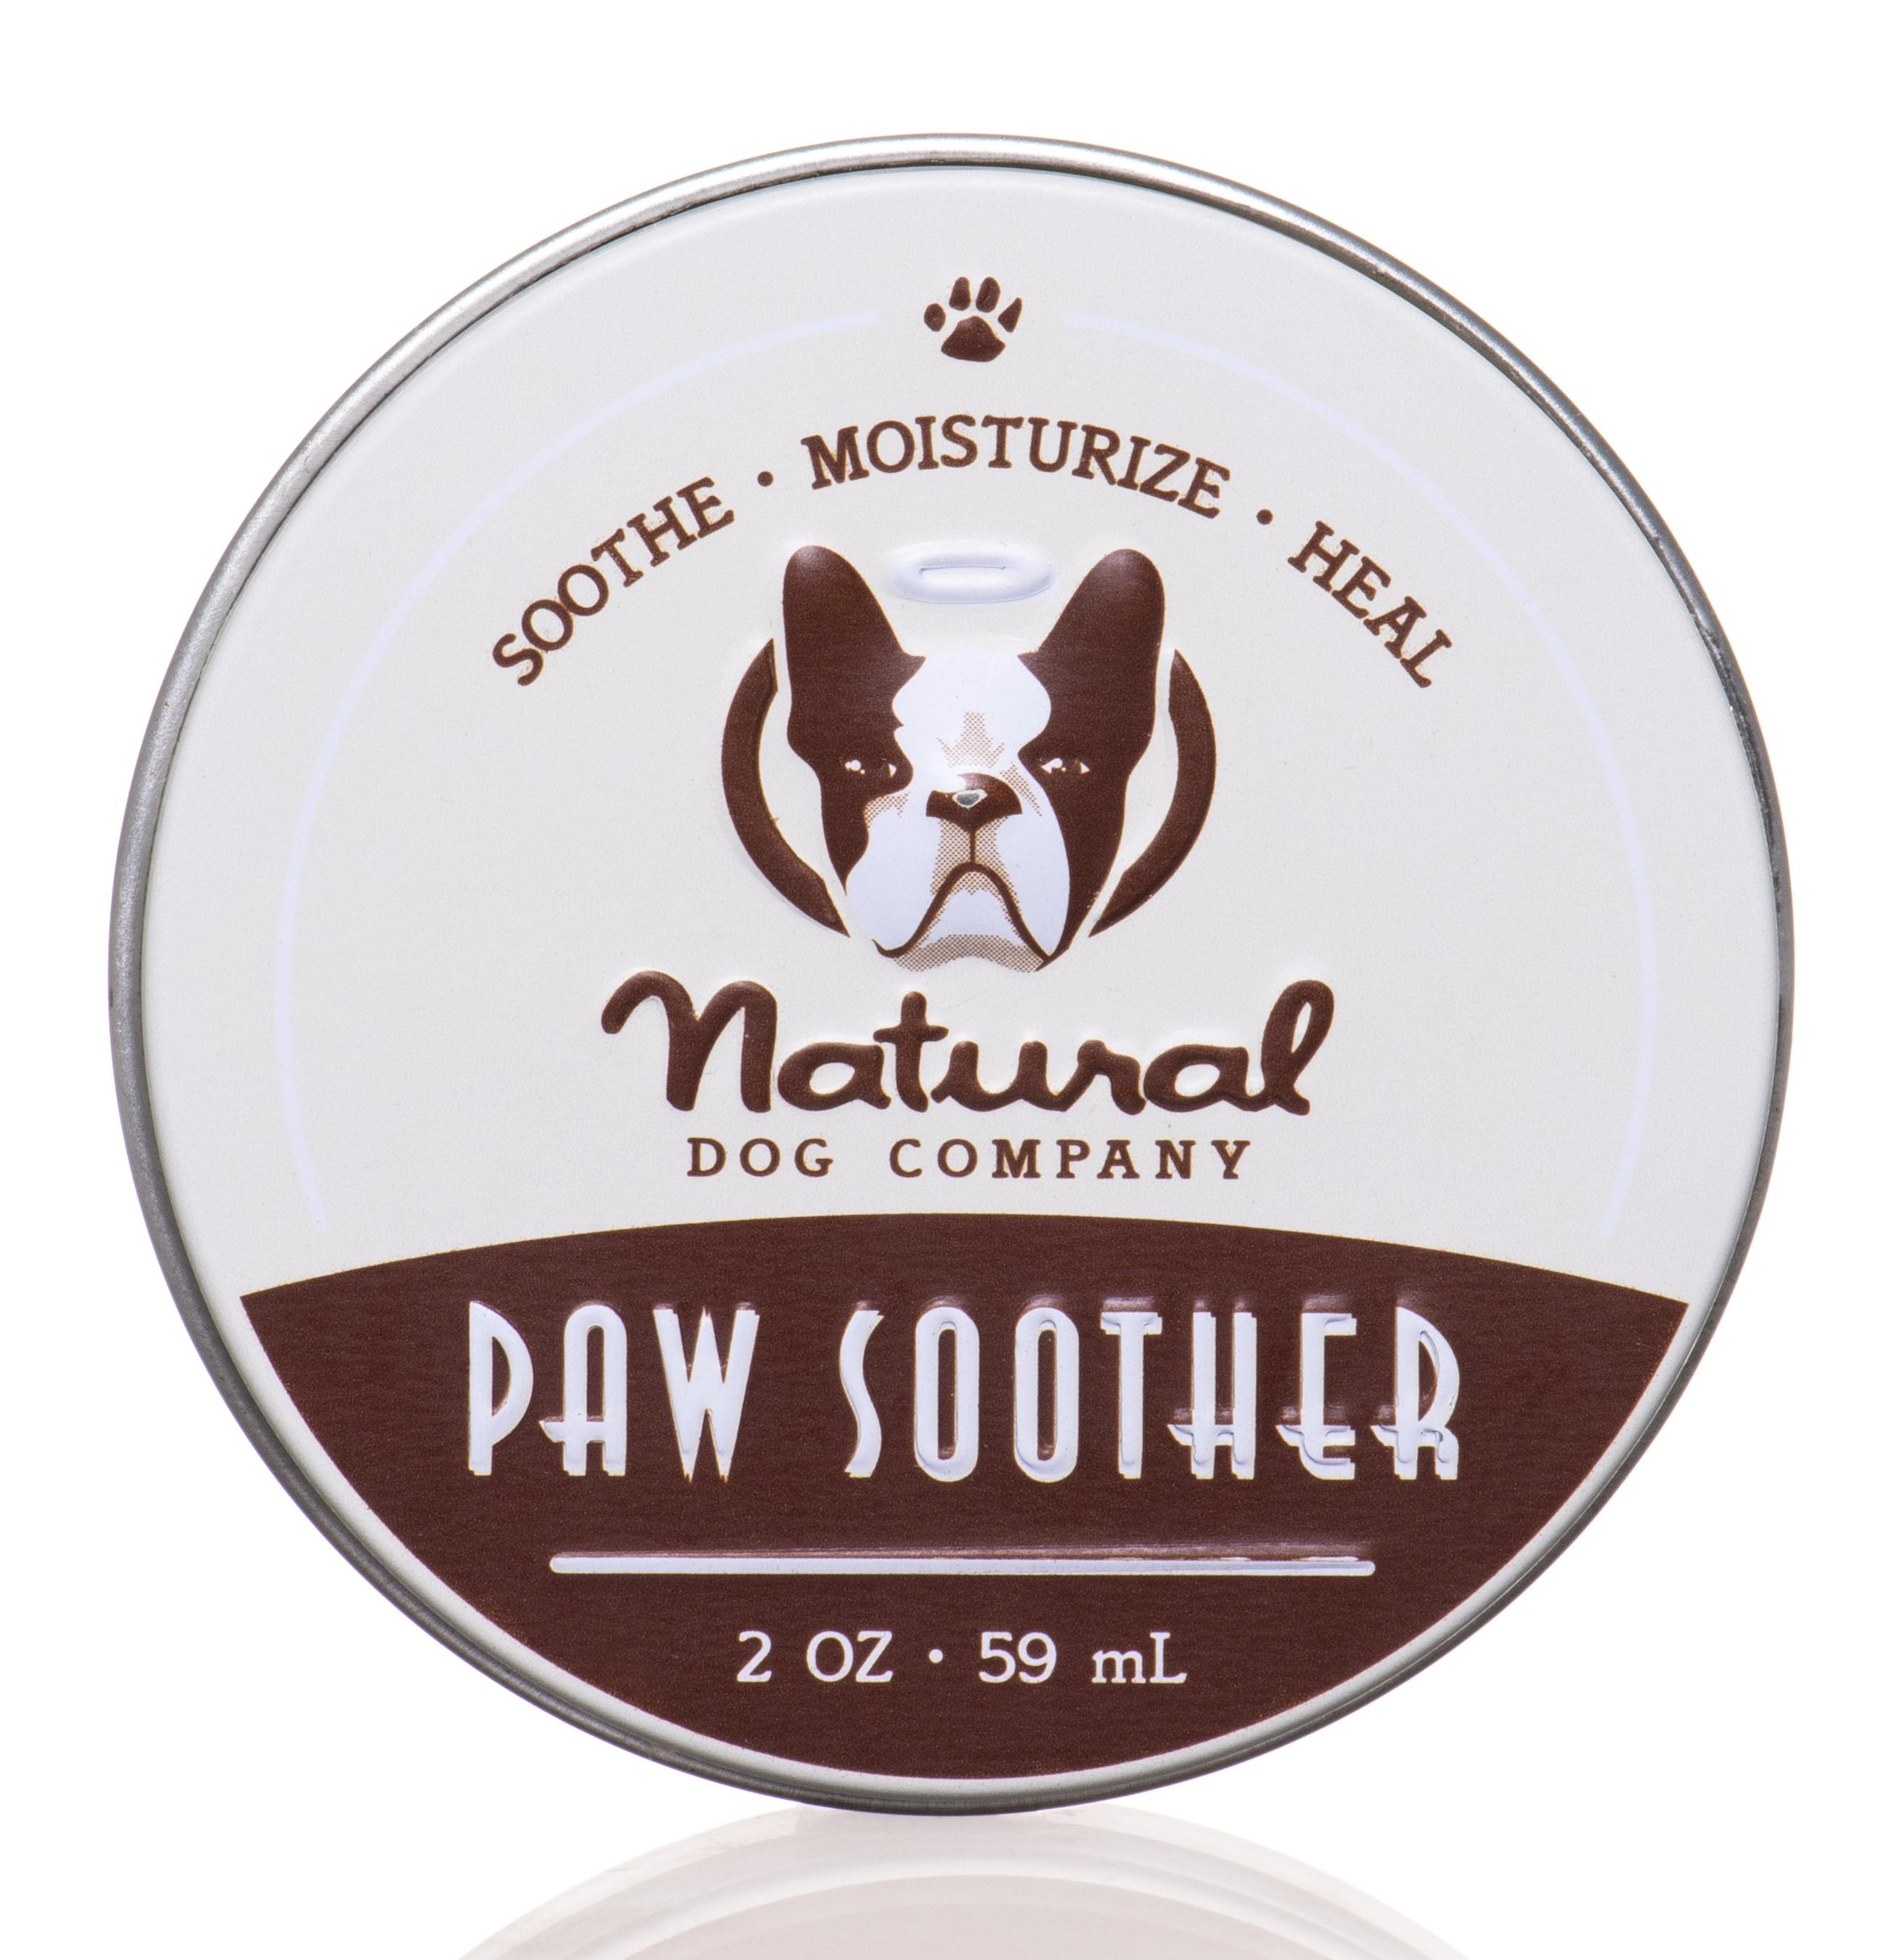 Natural Dog Company Paw soother - Balzám na tlapky Balzám na tlapky 59 ml